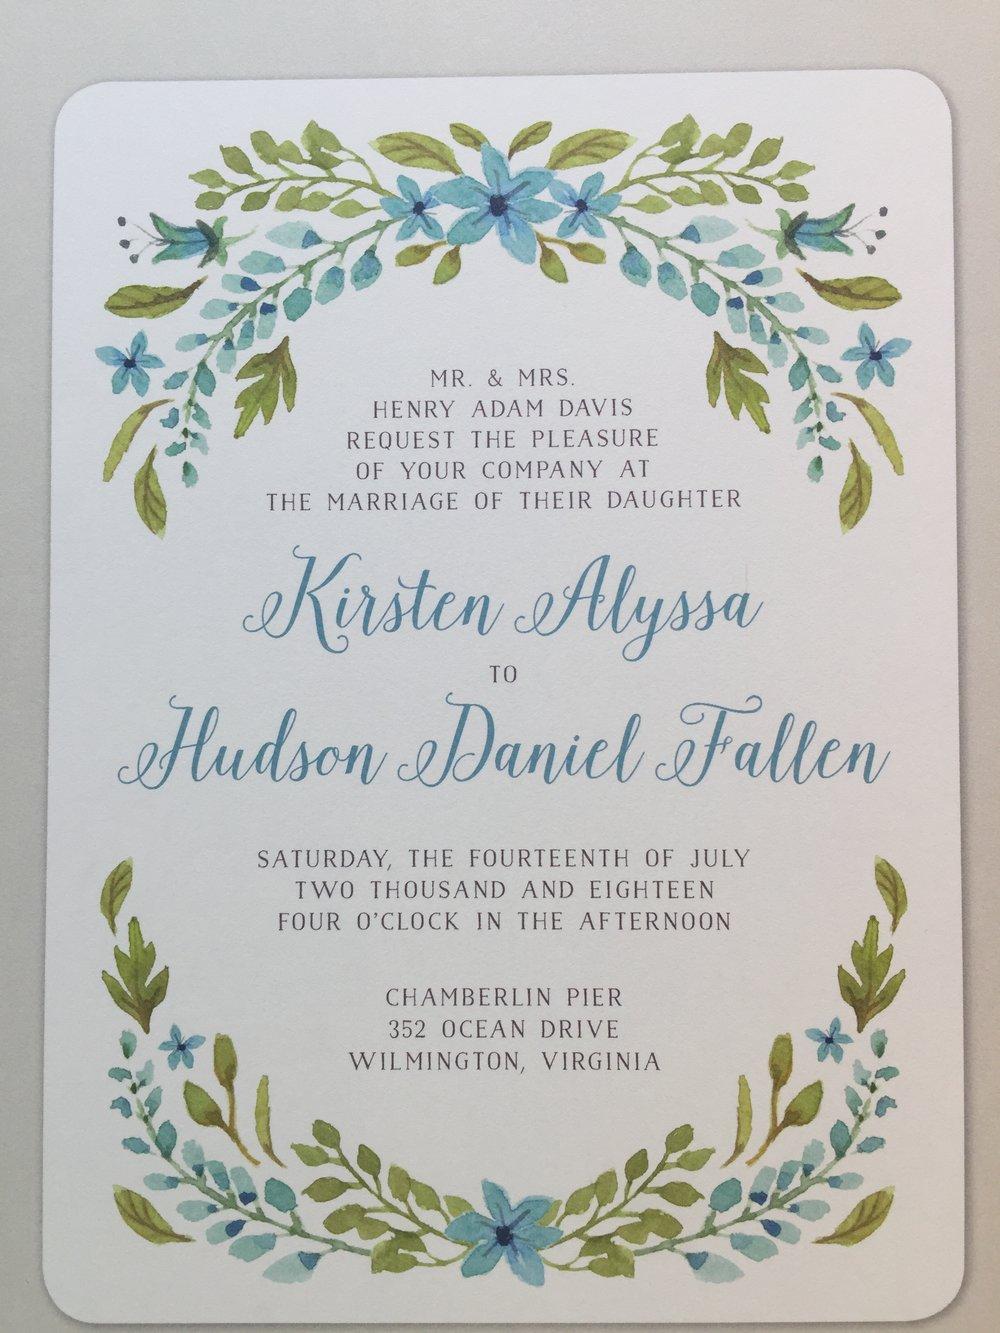 Wedding_invitation_4.png